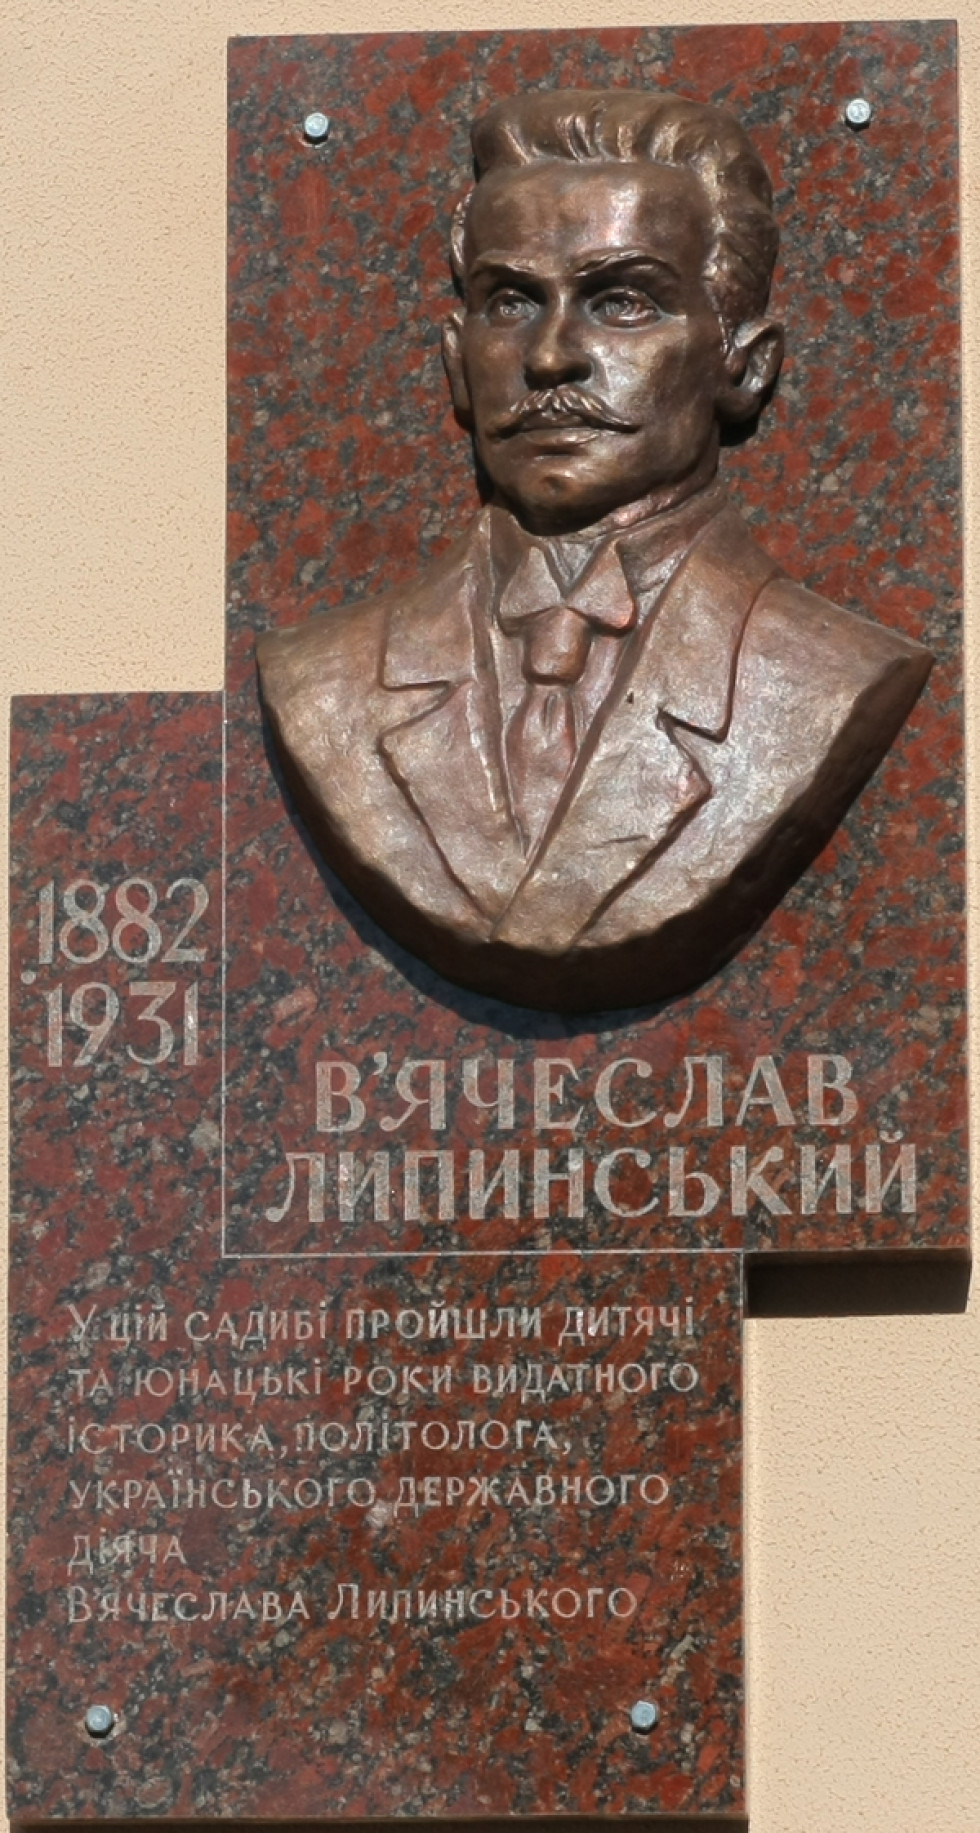 Музей В'ячеслава Липинського у Затурцях